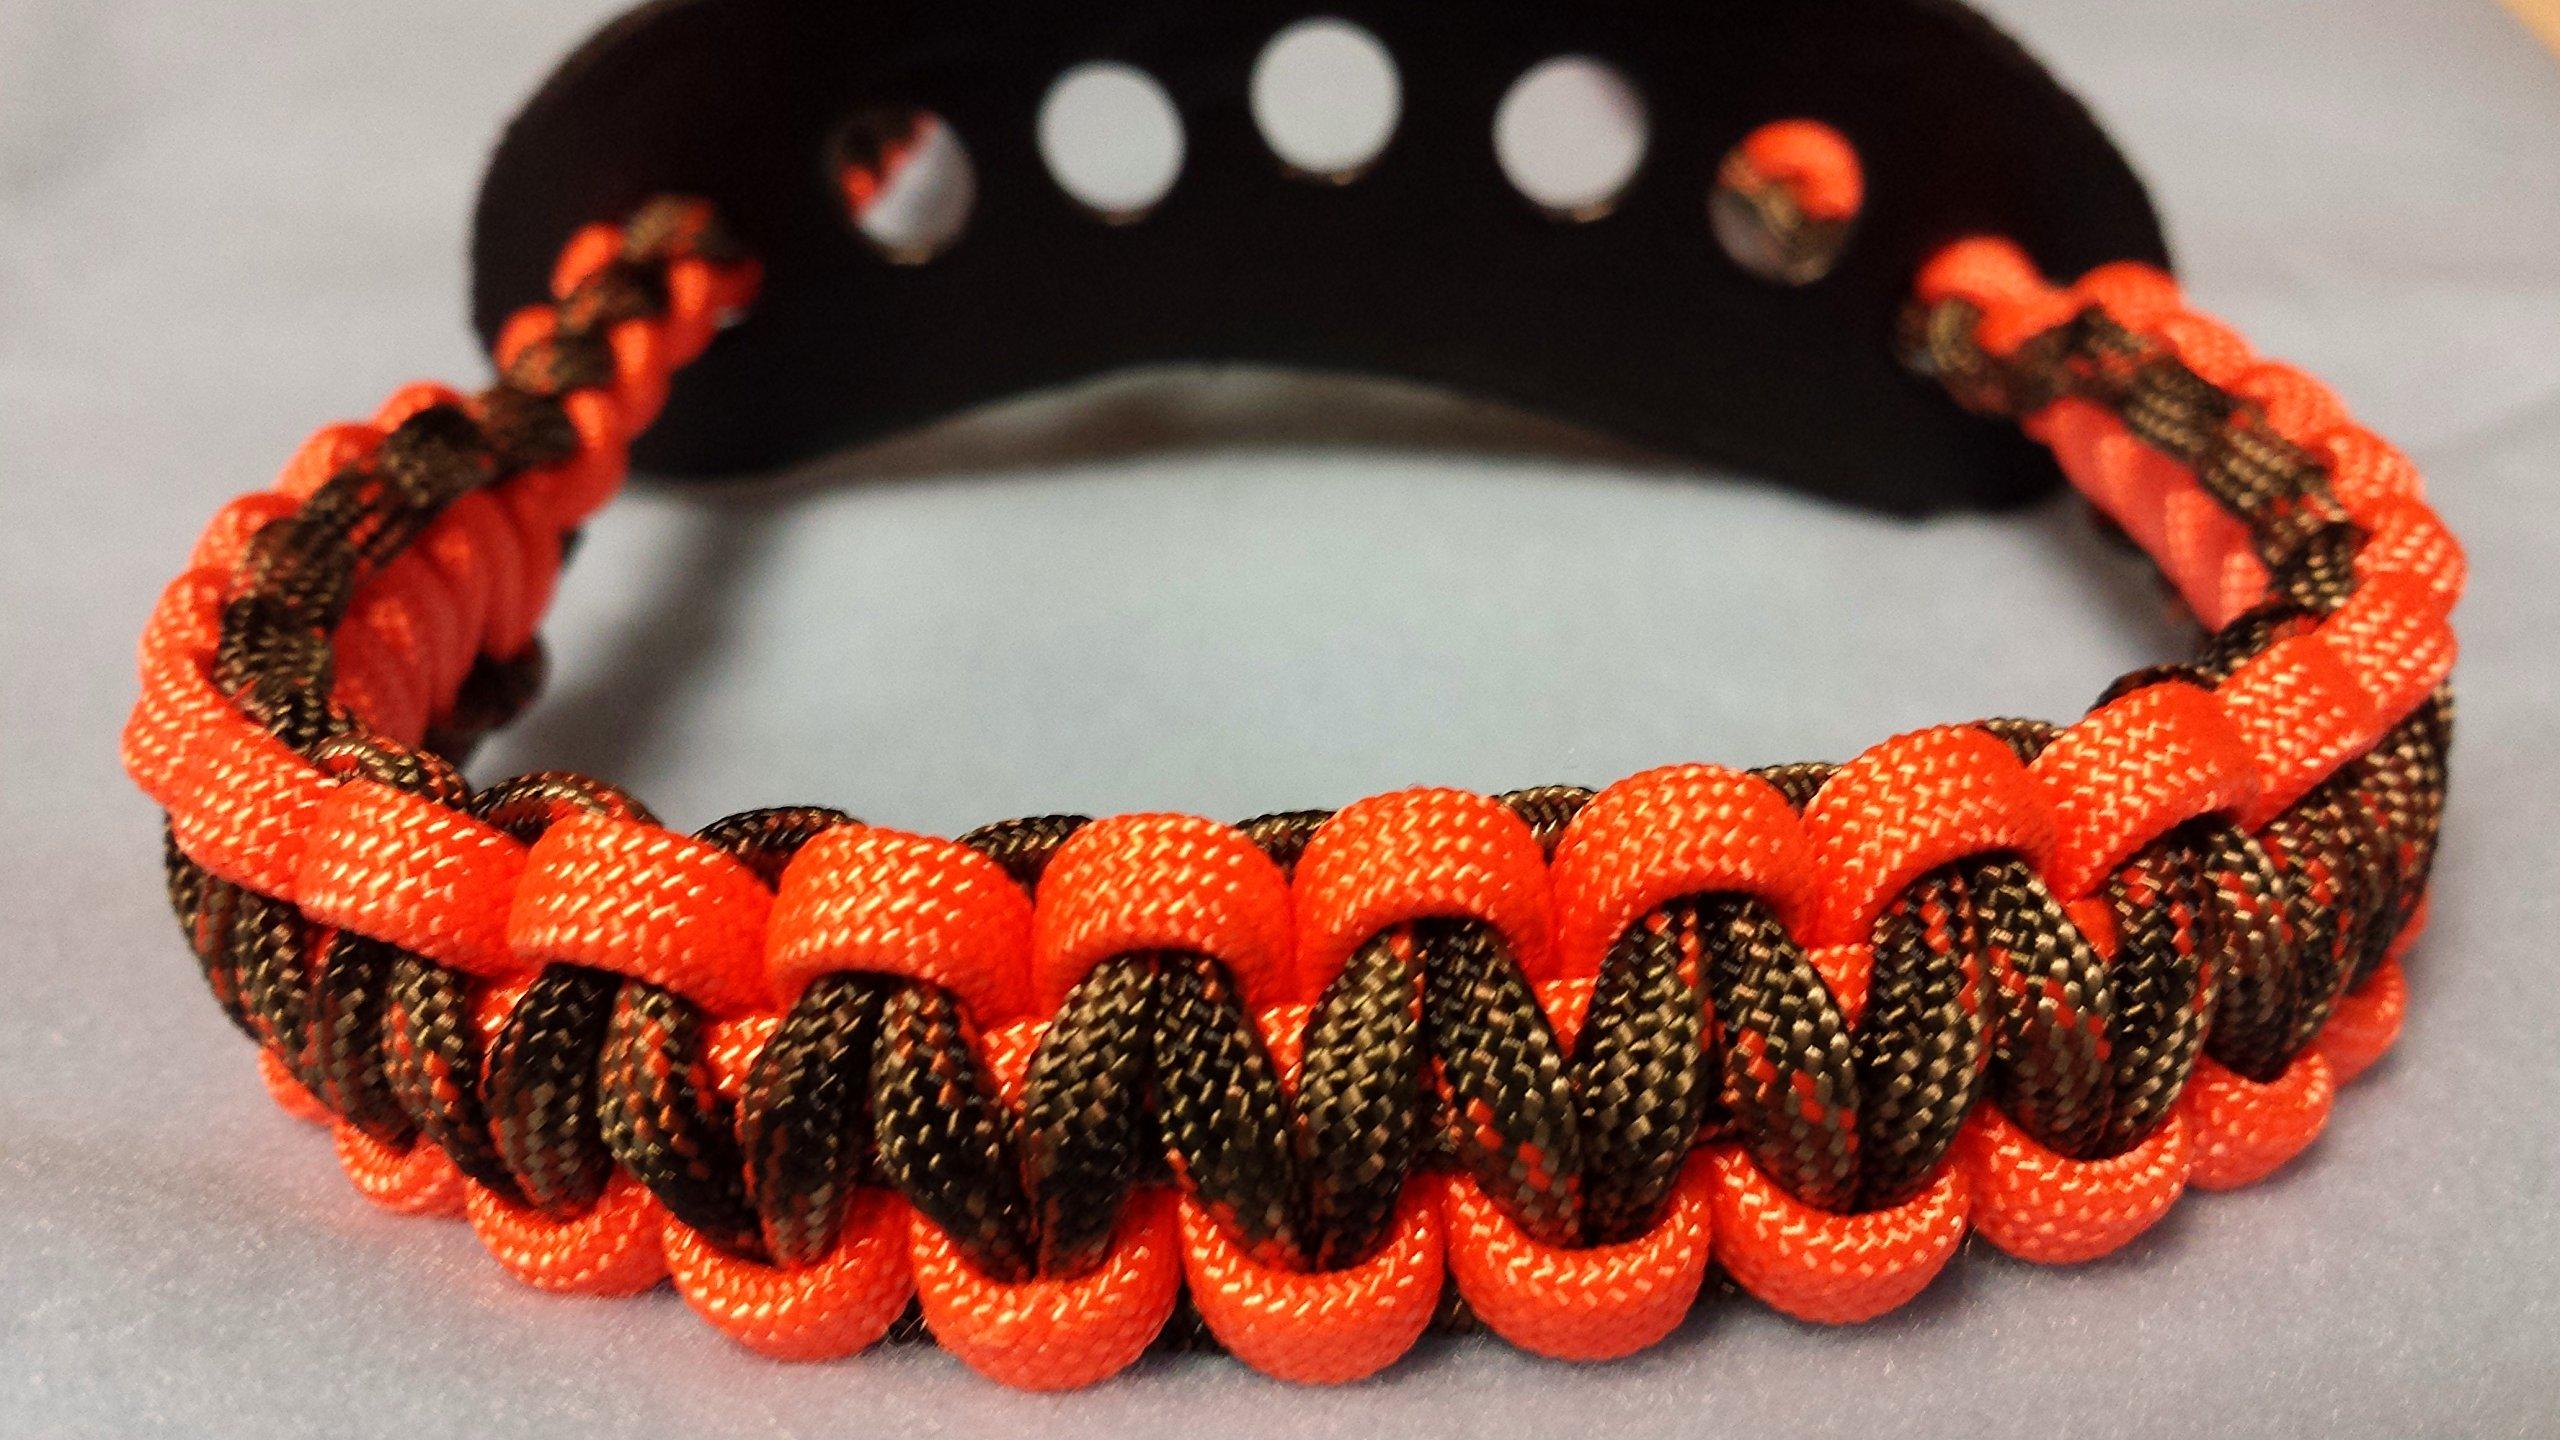 Muddy River Gear Archery Bow Wrist Sling Orange and Treestand Camo